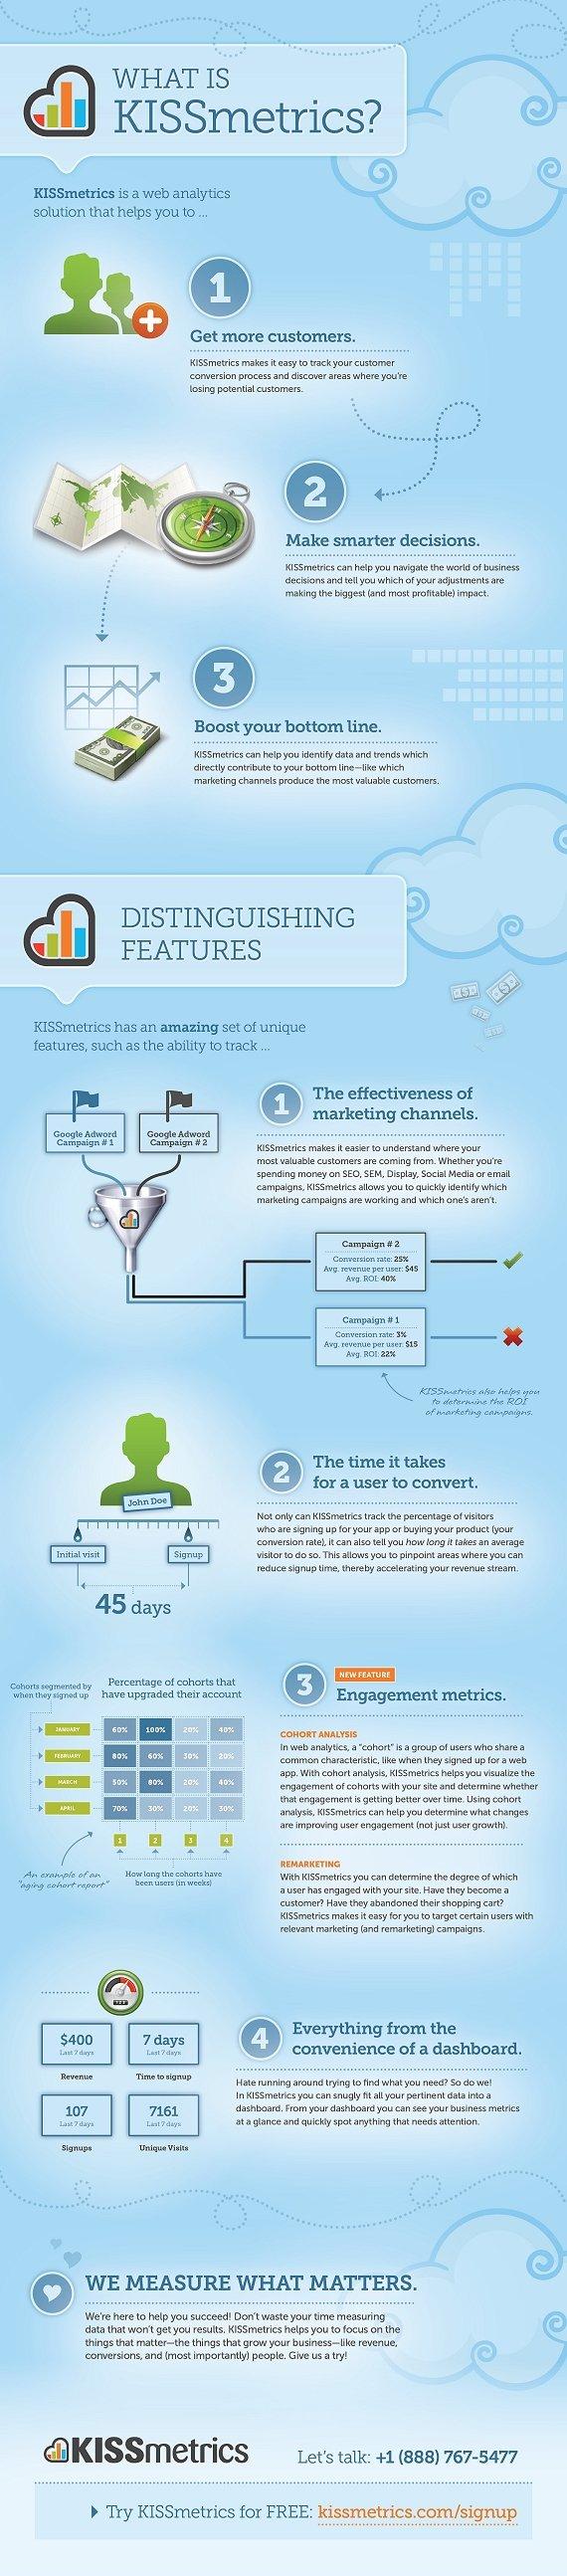 What is kissmetrics? #infographic